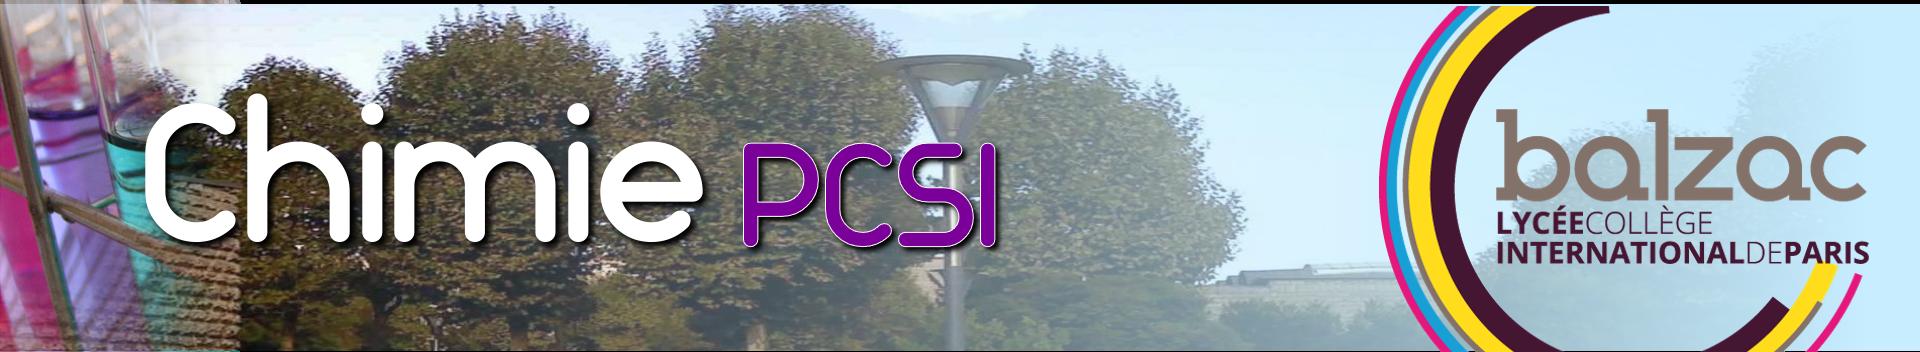 Chimie en PCSI